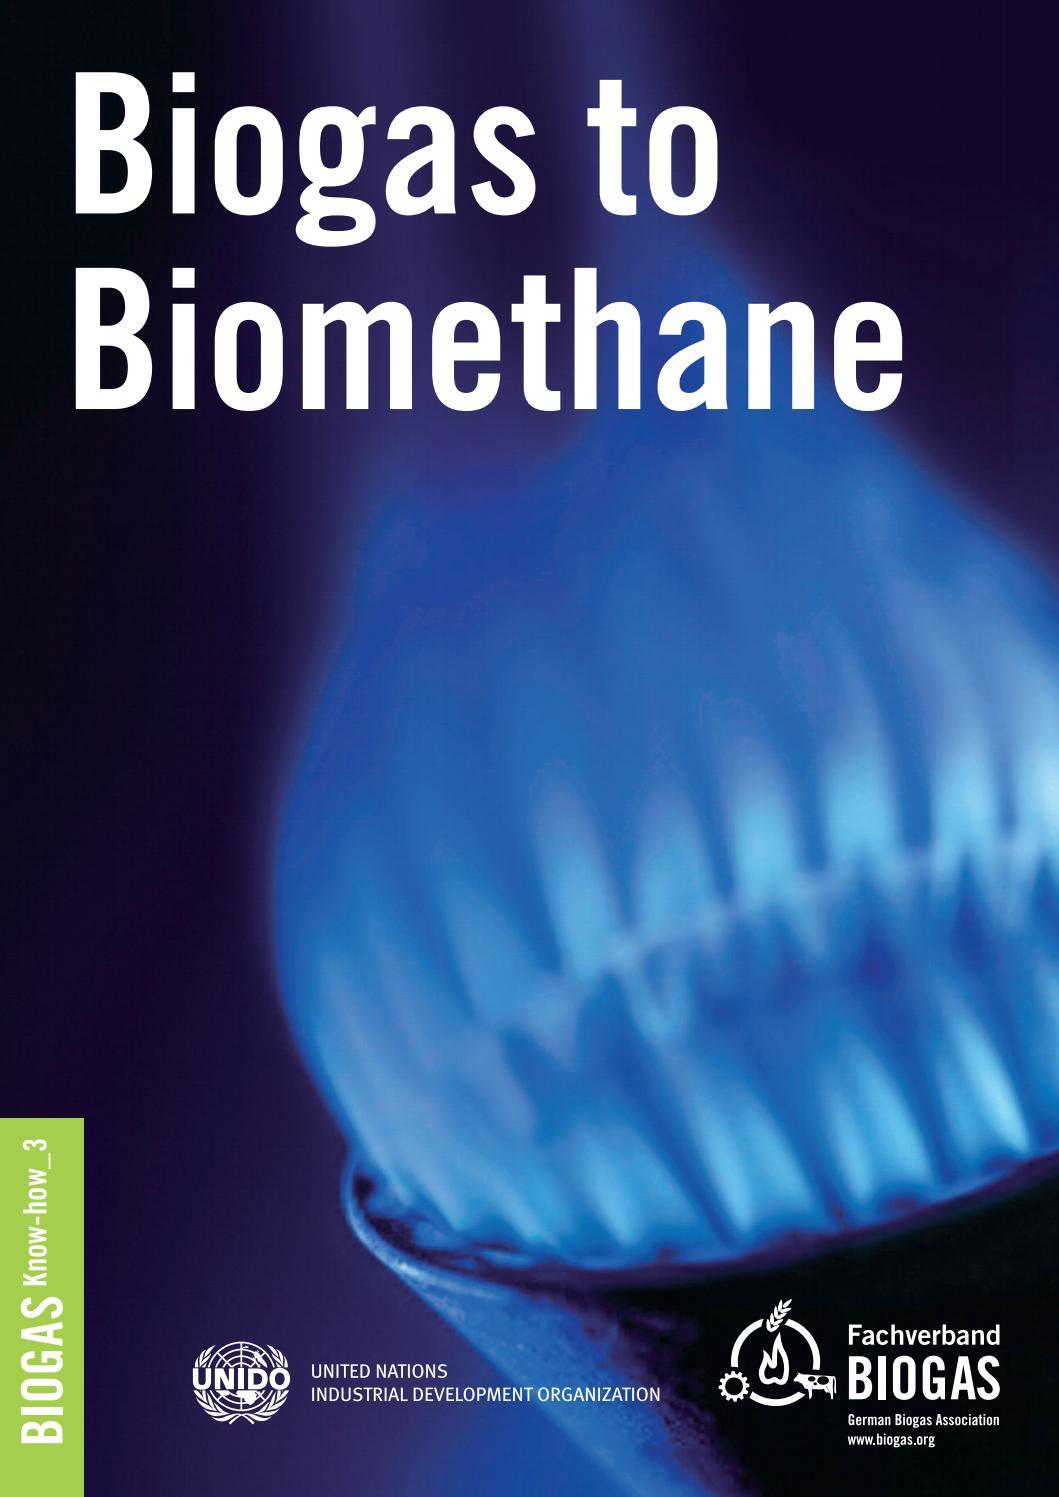 Biogas to Biomethane by Fachverband Biogas e V  - issuu